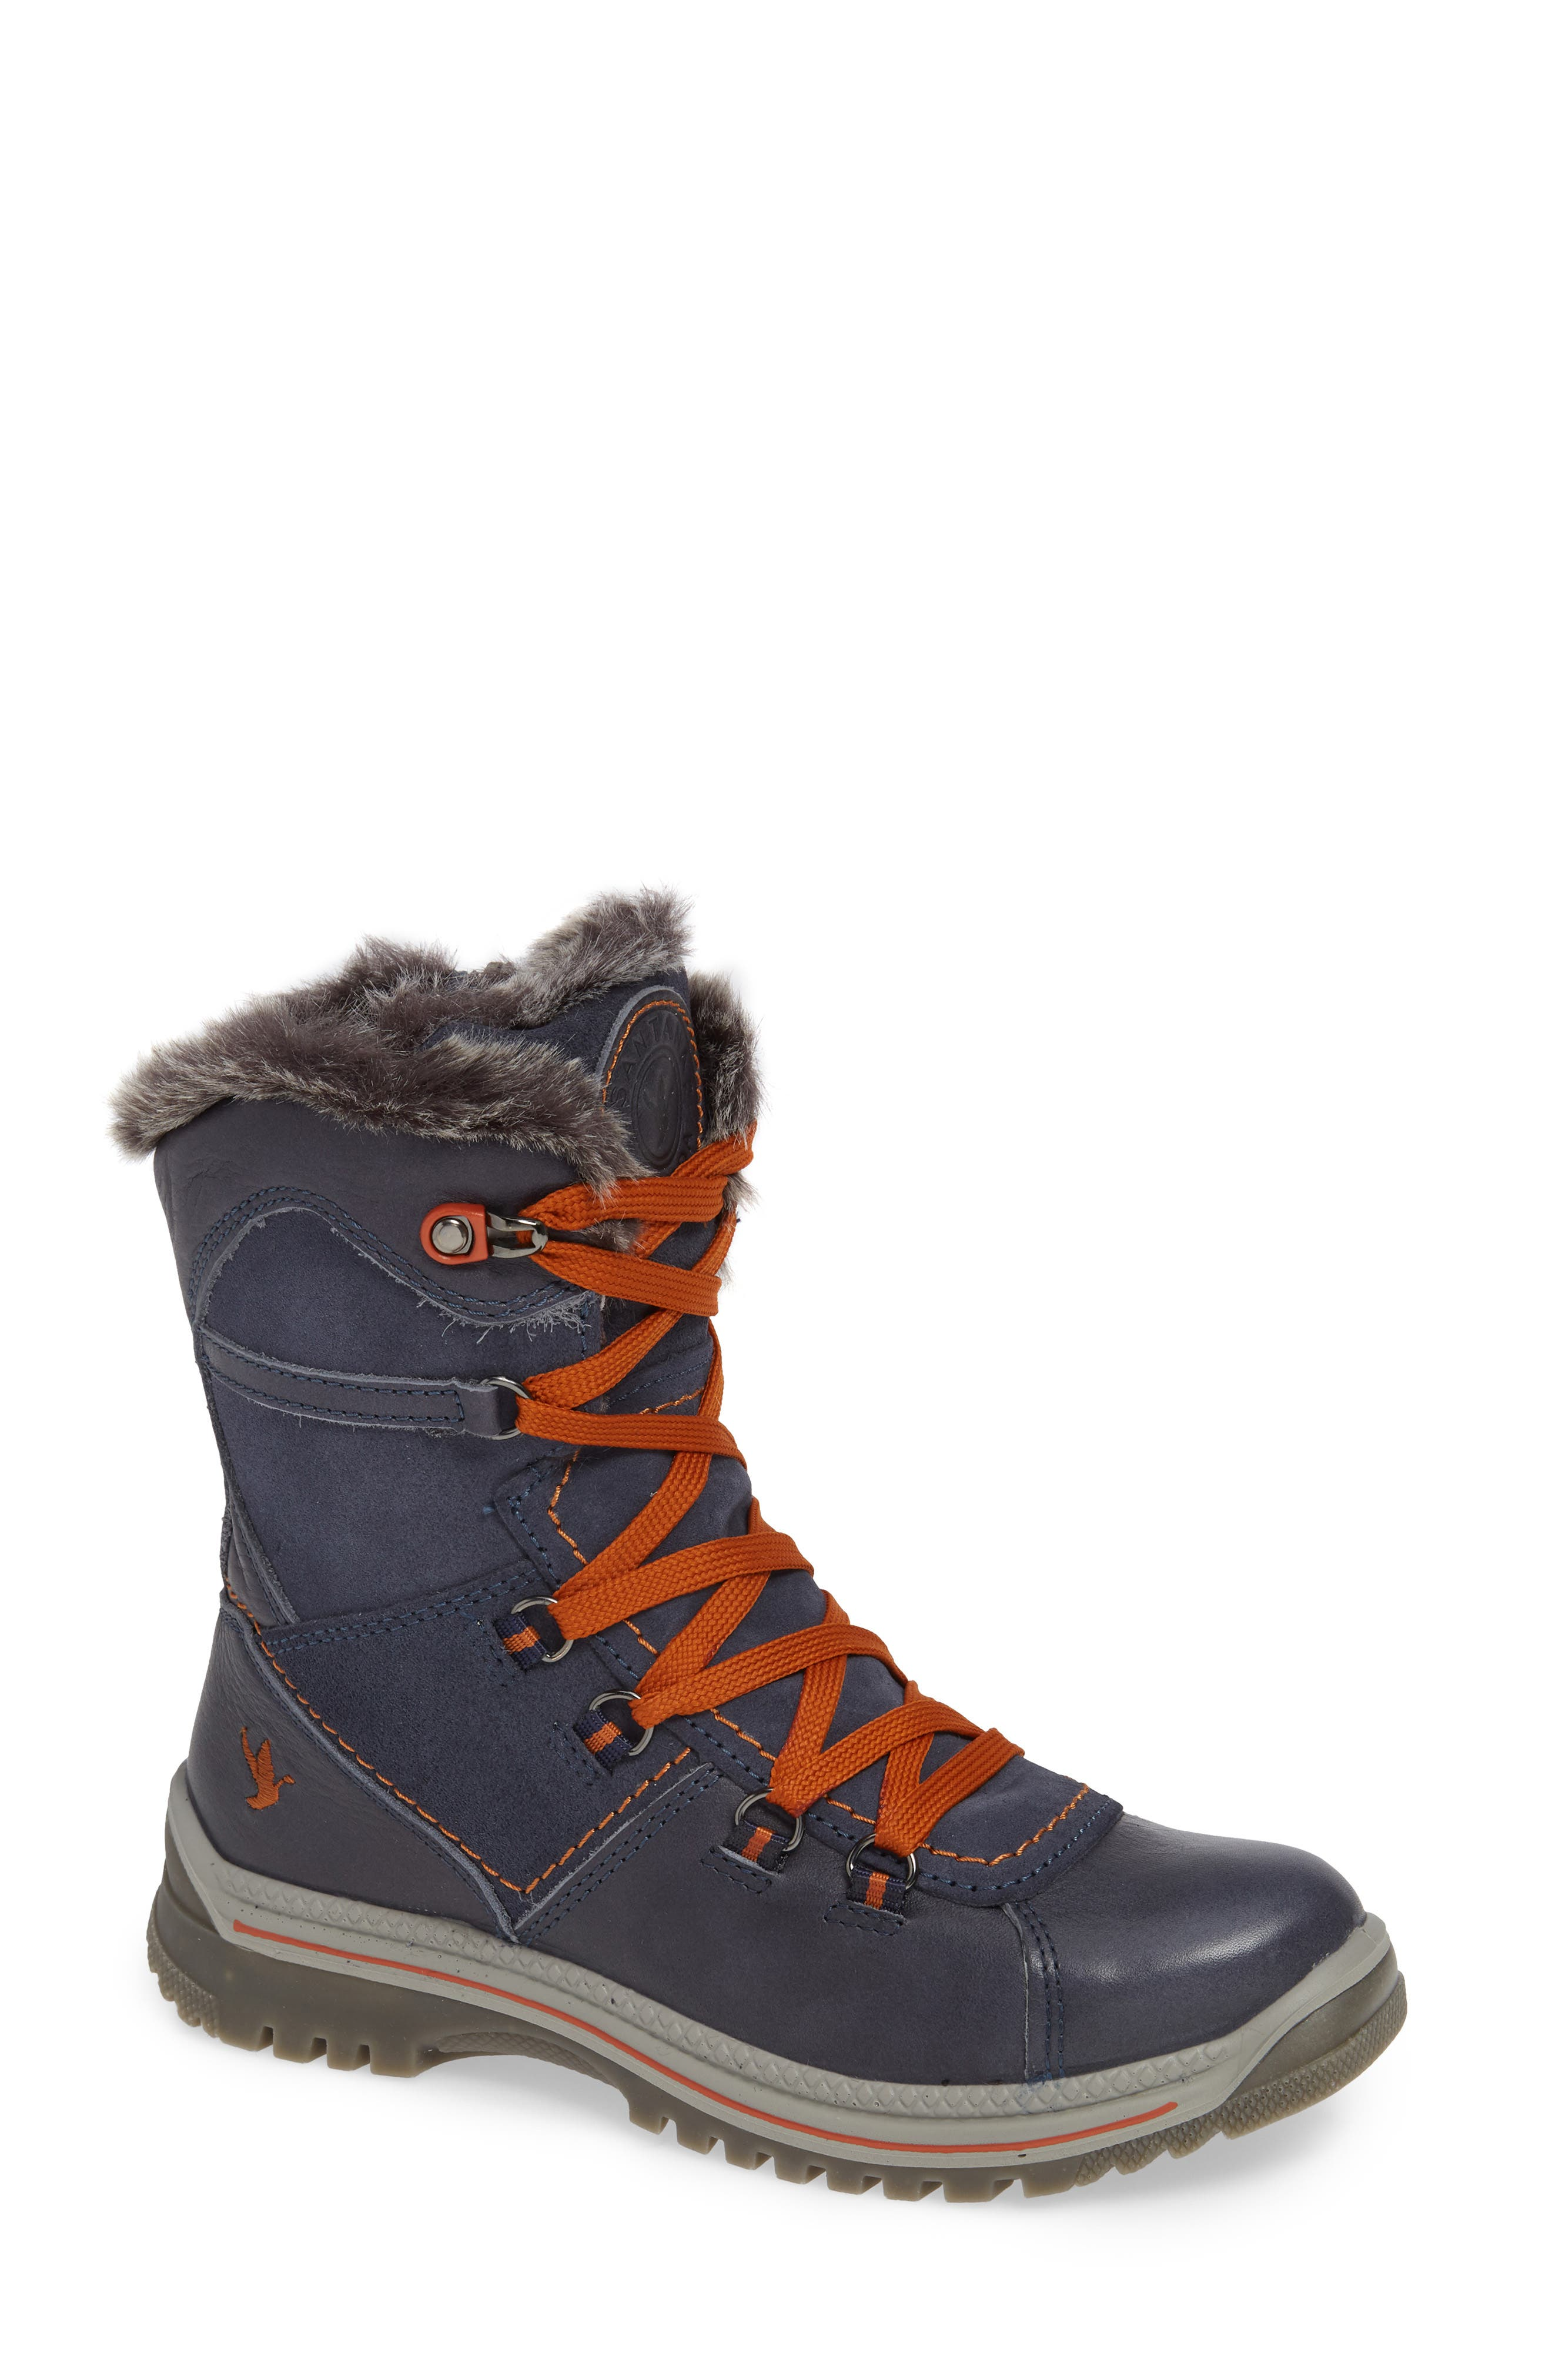 Santana Canada Majesta Luxe Waterproof Winter Boot, Blue